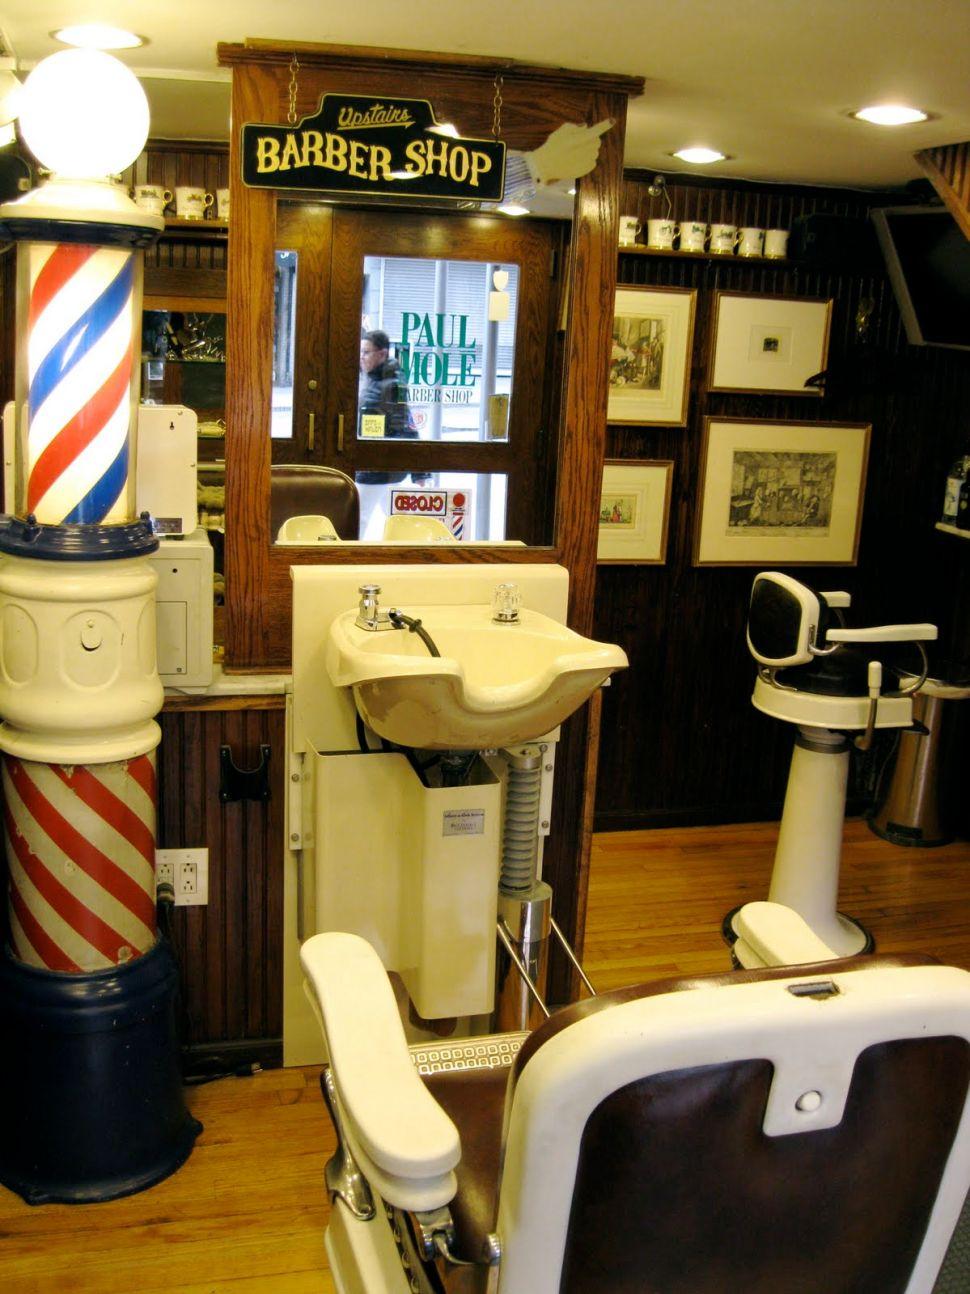 Paul Molé's Barbershop Quartet: Fourth Location Marks 100th Year